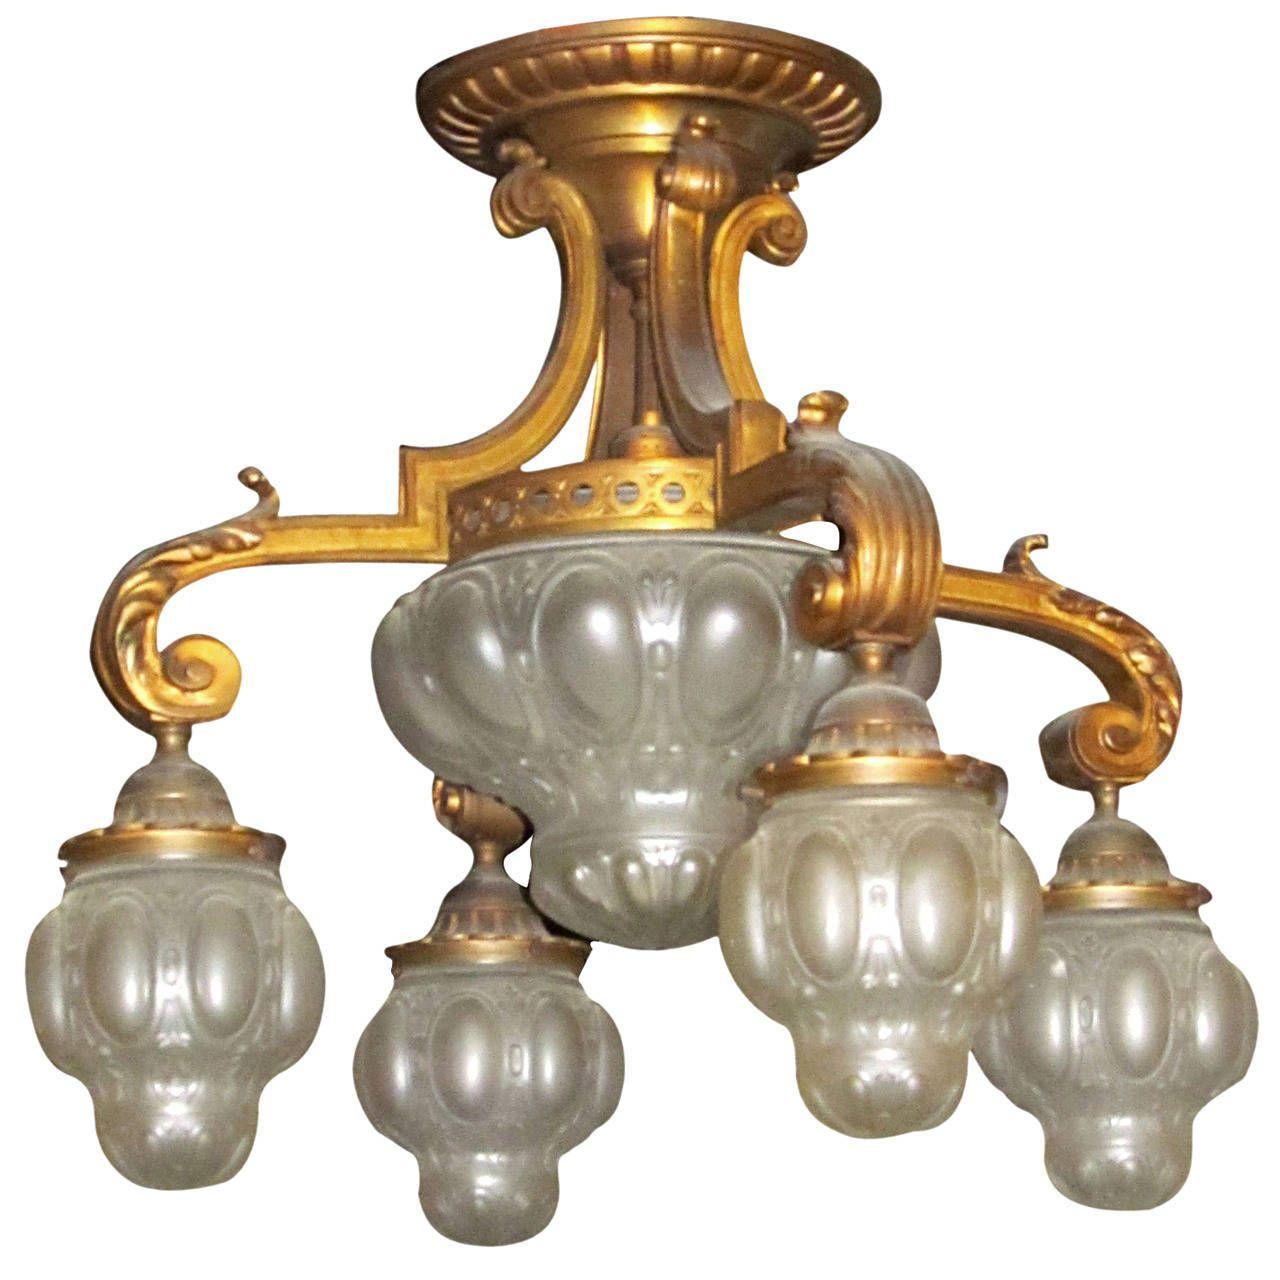 1910s cast bronze flush mount downlight chandelier with cast glass 1910s cast bronze flush mount downlight chandelier with cast glass globes from a unique collection arubaitofo Images